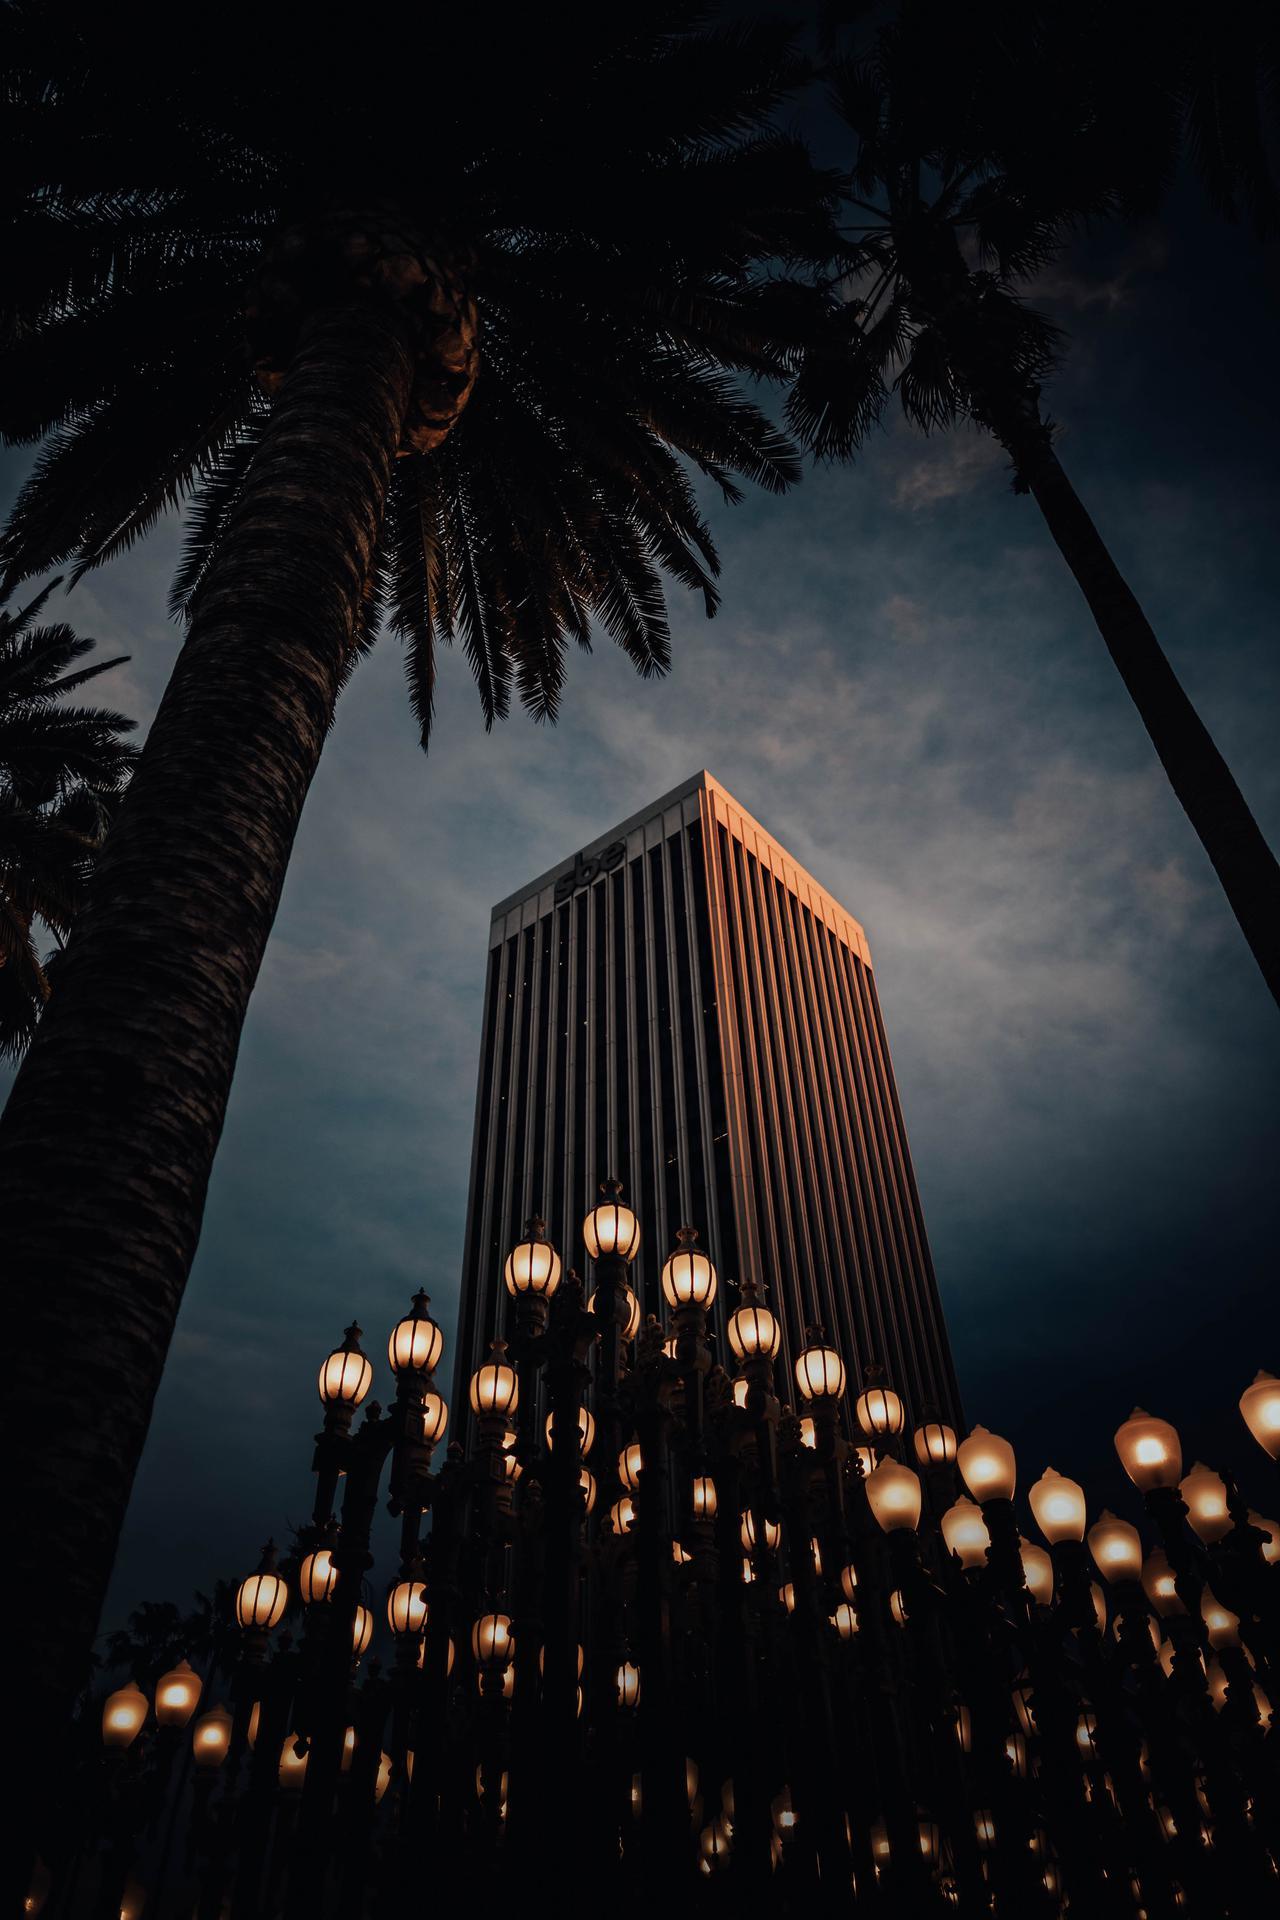 high-rise-building-near-lighted-lamp-posts-2618694.jpg